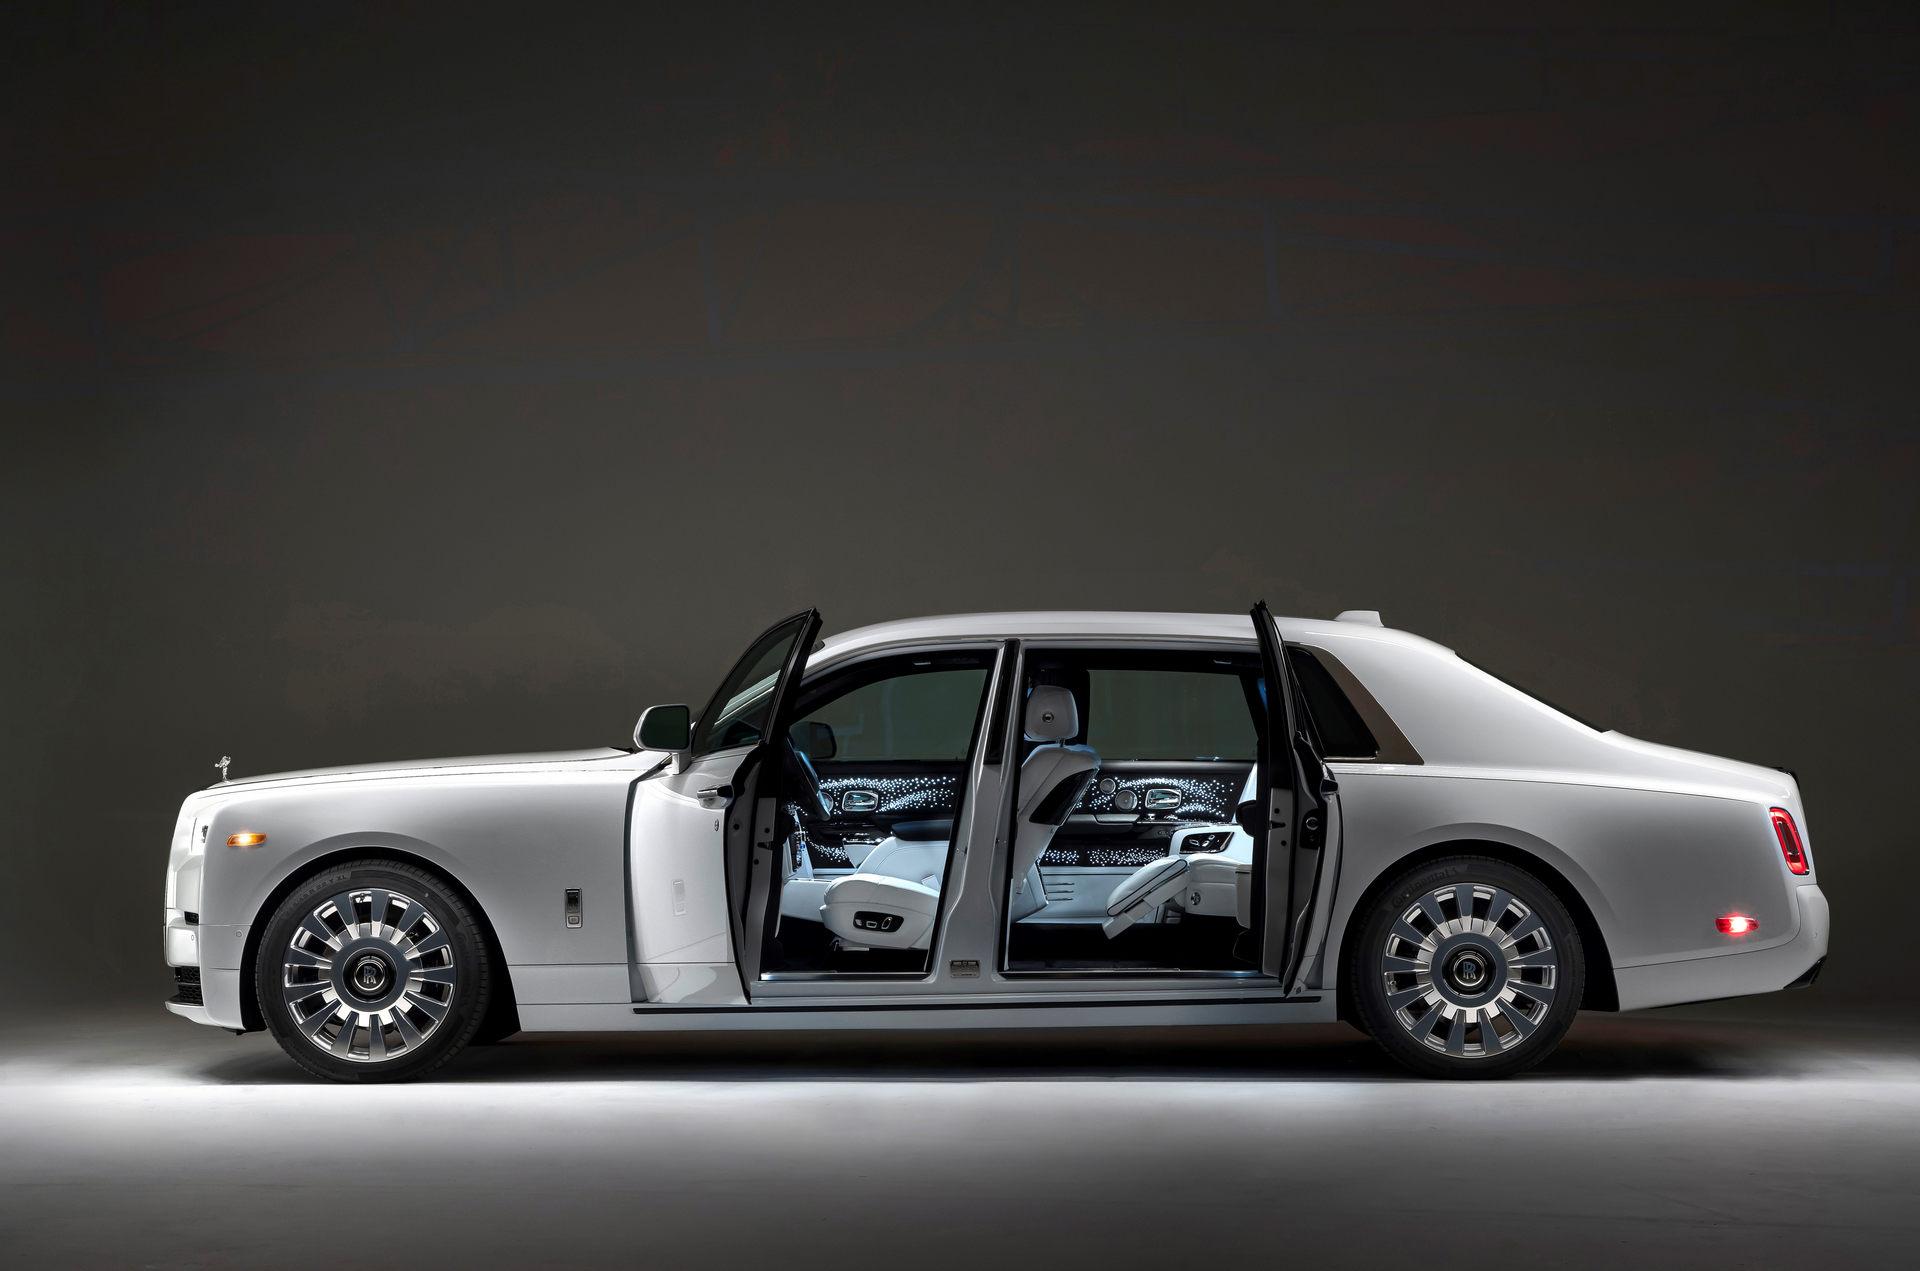 Bespoke-Rolls-Royce-Phantom-and-Dawn-17